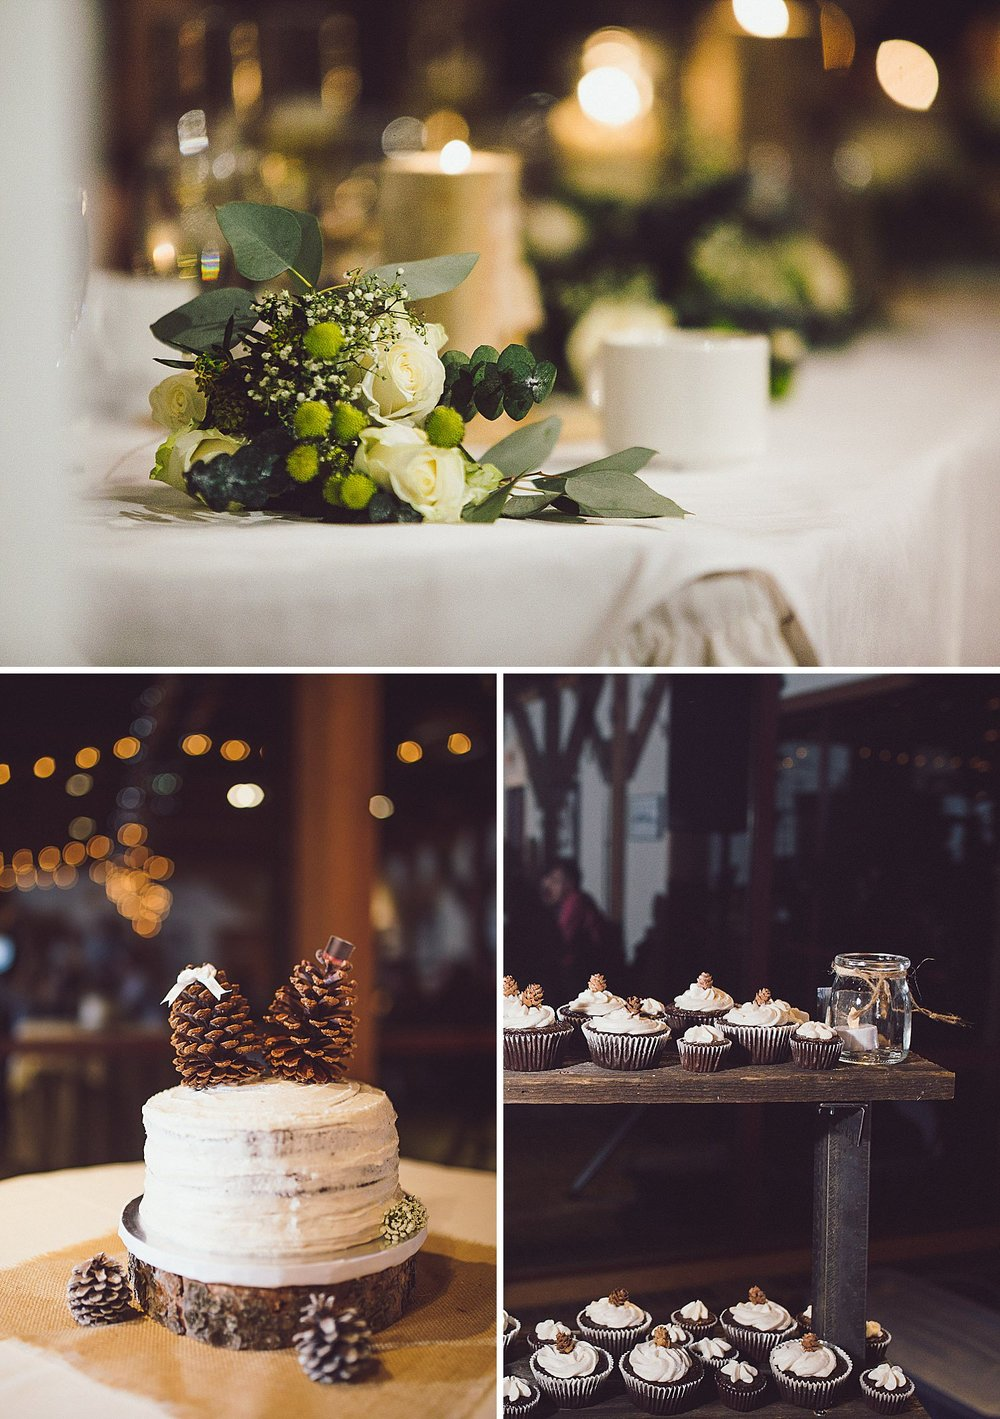 Wedding decor and details at the Diamond Alumni Centre